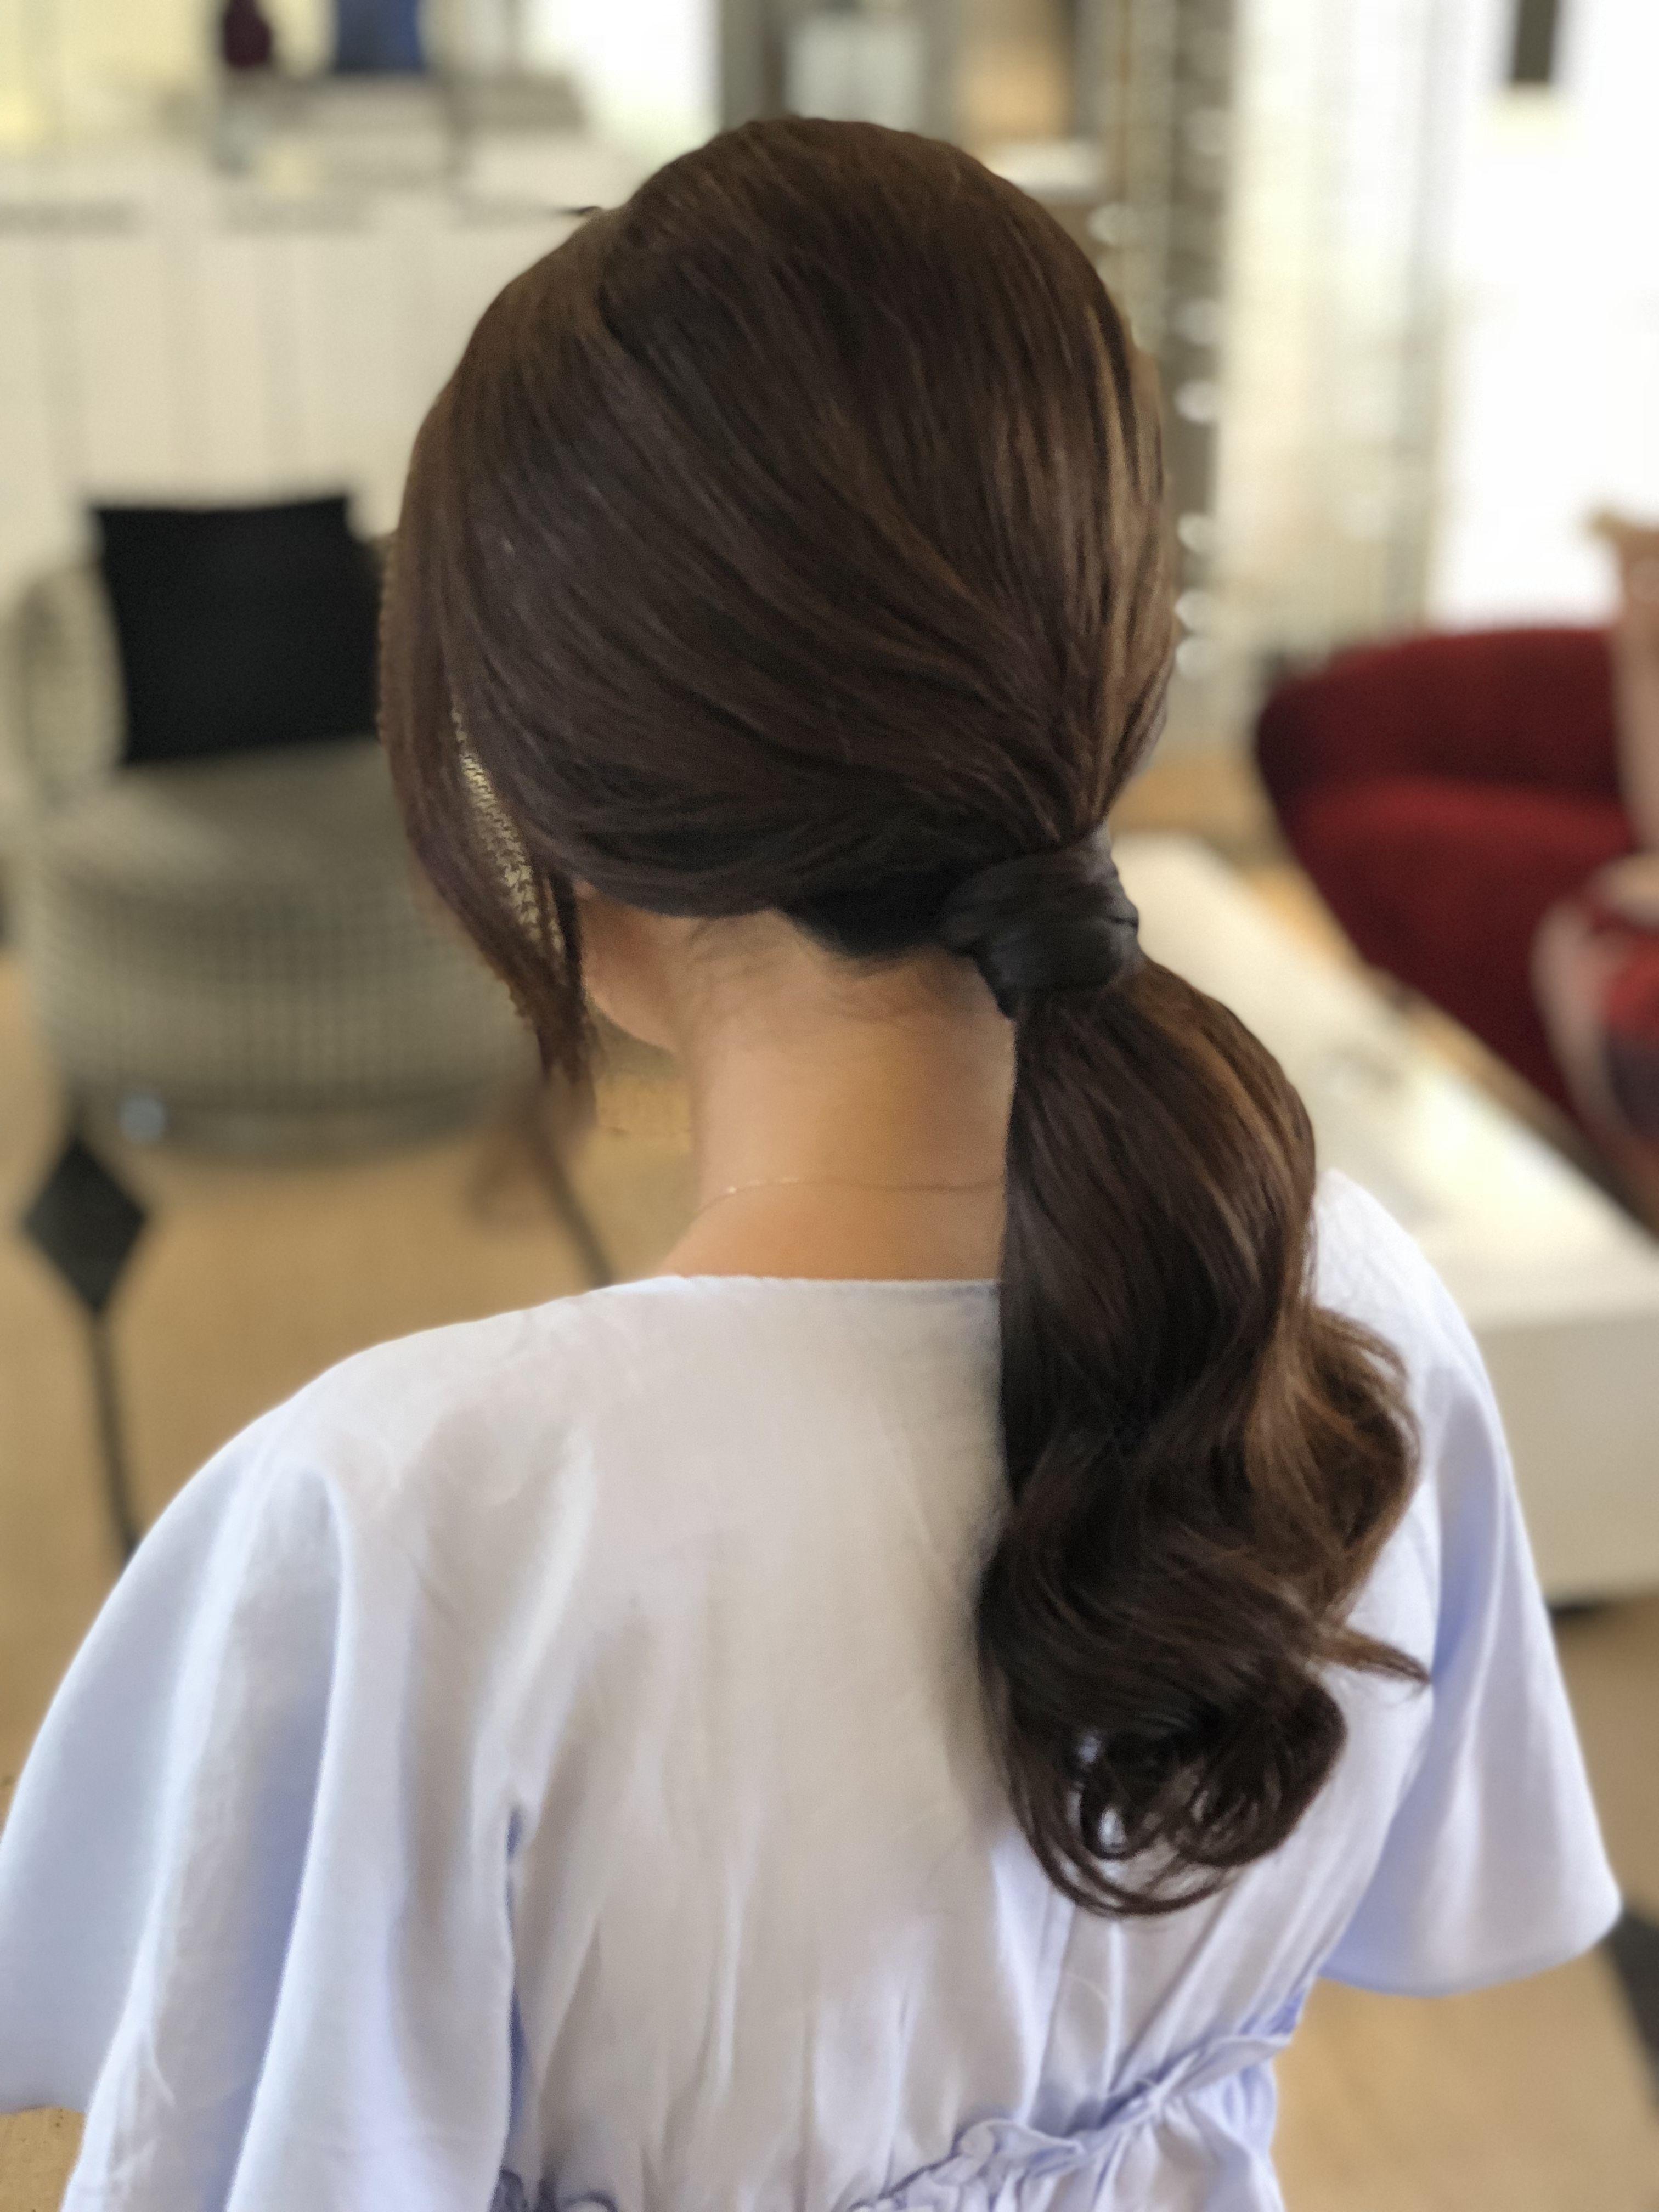 Wassimmorkos lebanon hair hairstyle haircut hairfashion